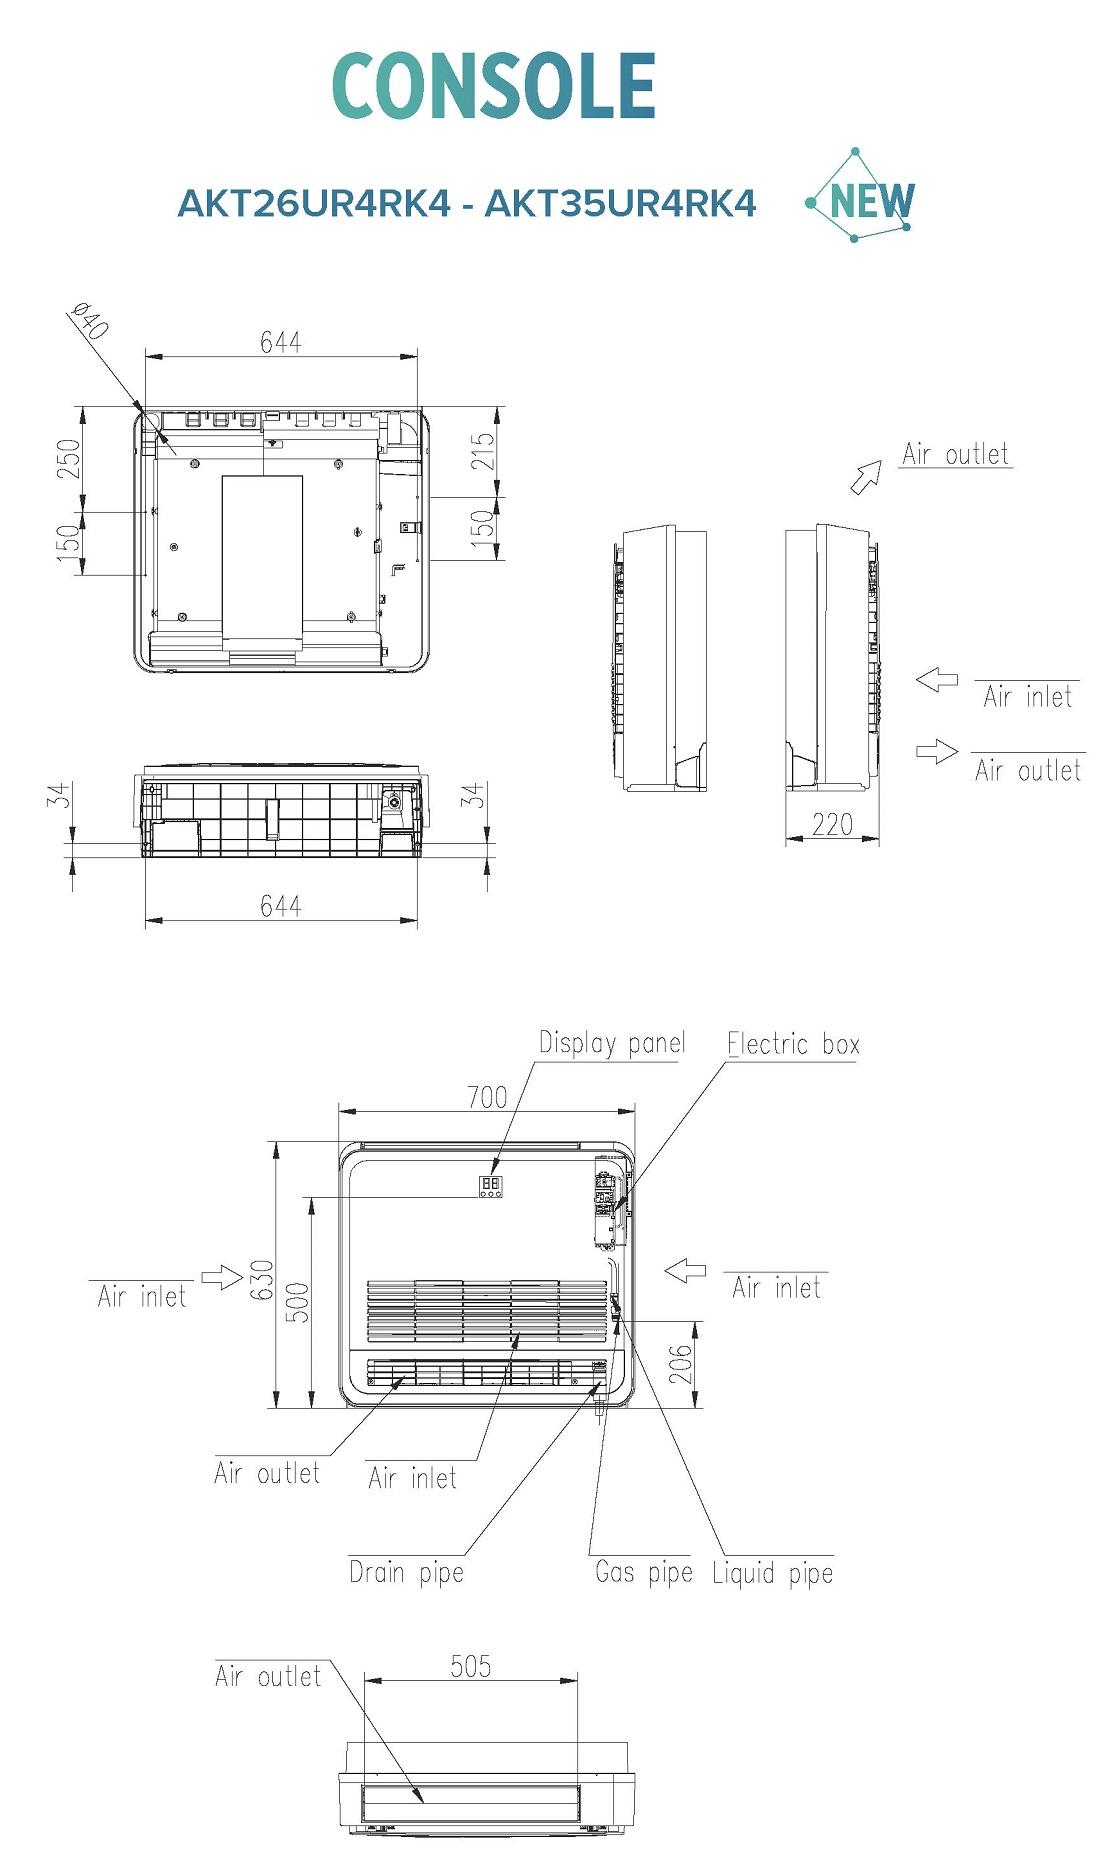 Condizionatore Hisense Commerciale 12000 Btu AKT35UR4RK4 A++/A+